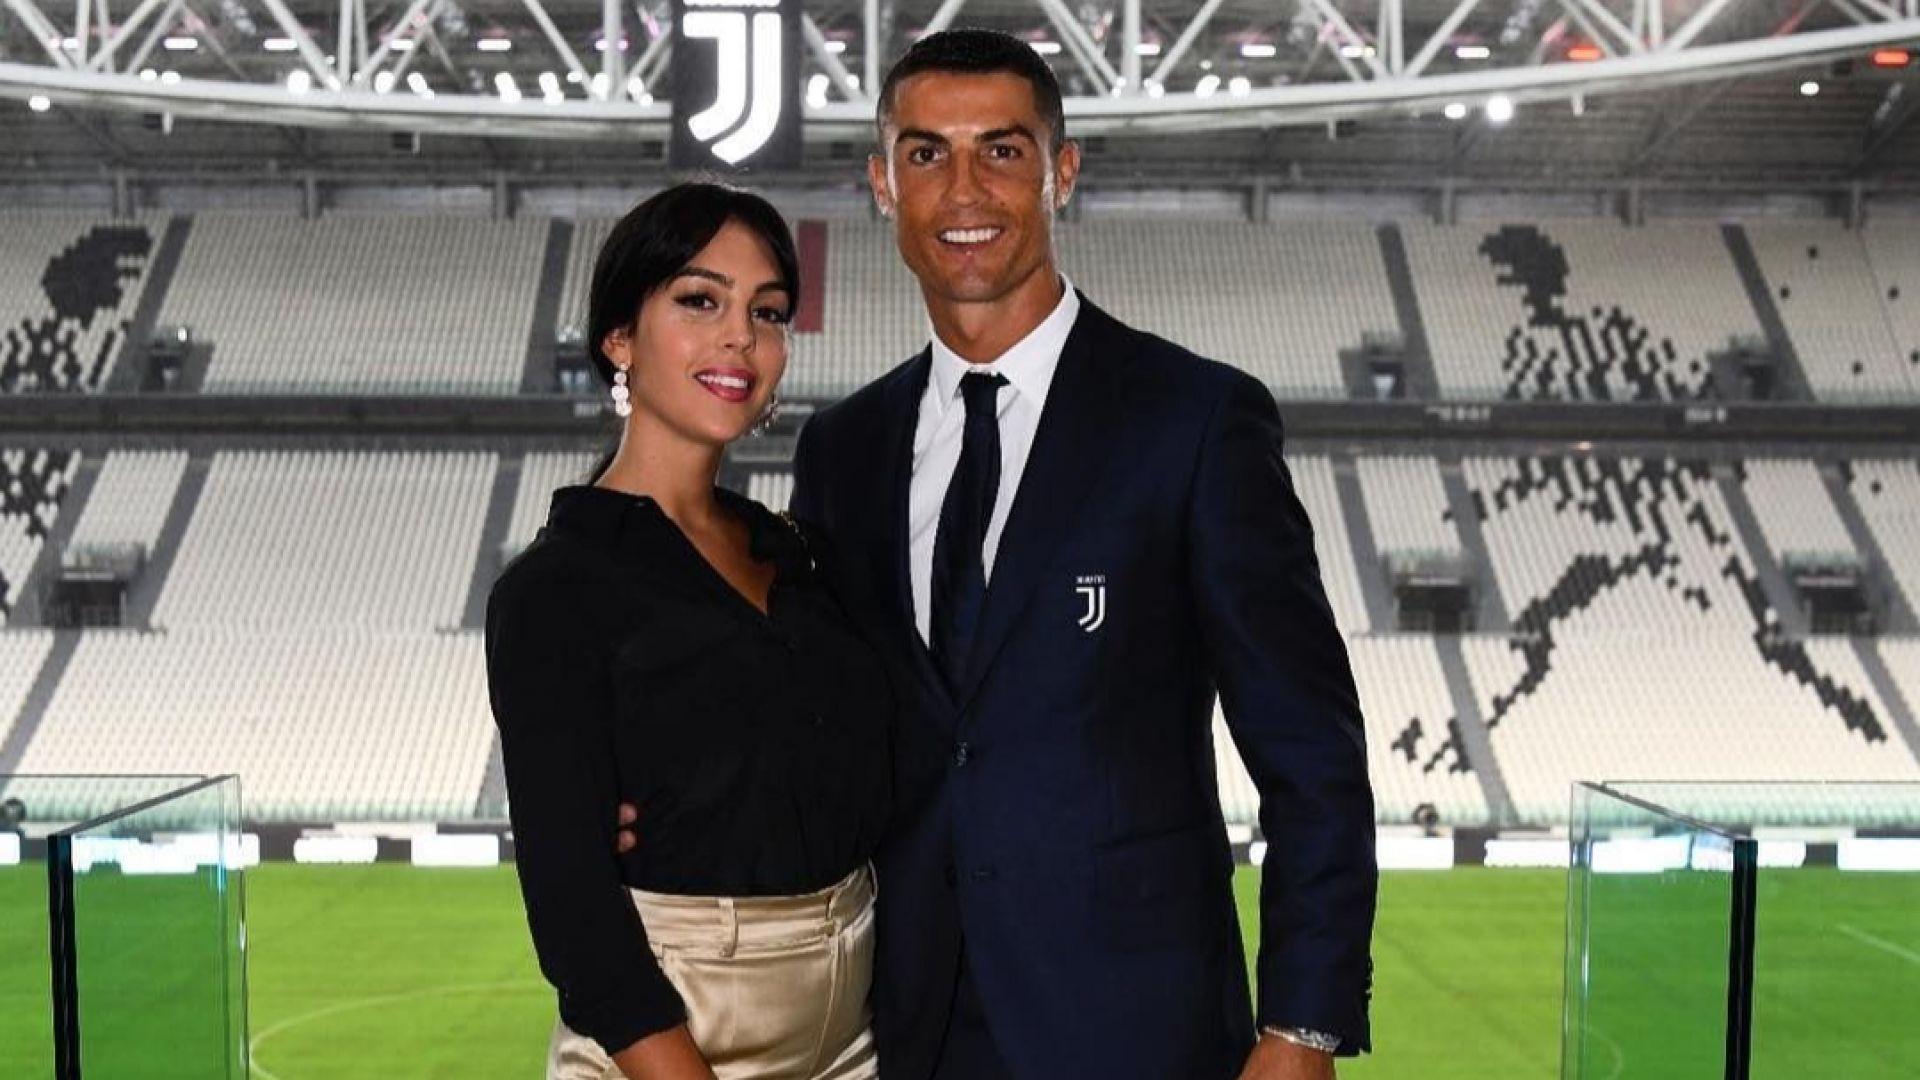 Нови доказателства, че Роналдо и Джорджина са се сгодили